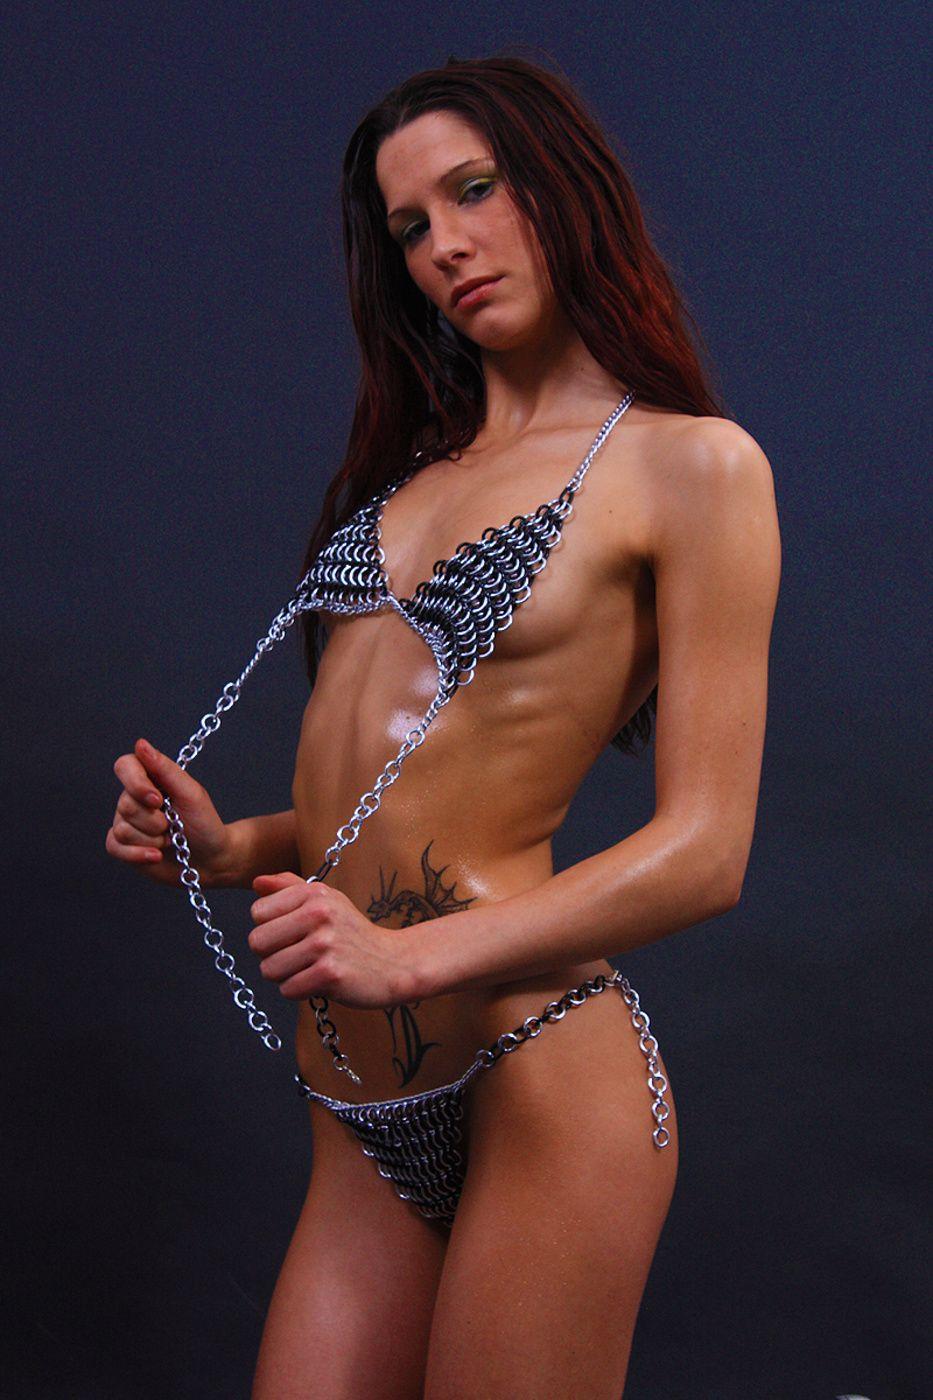 strip-sexy-girls-wifeys-world-with-curlers-porn